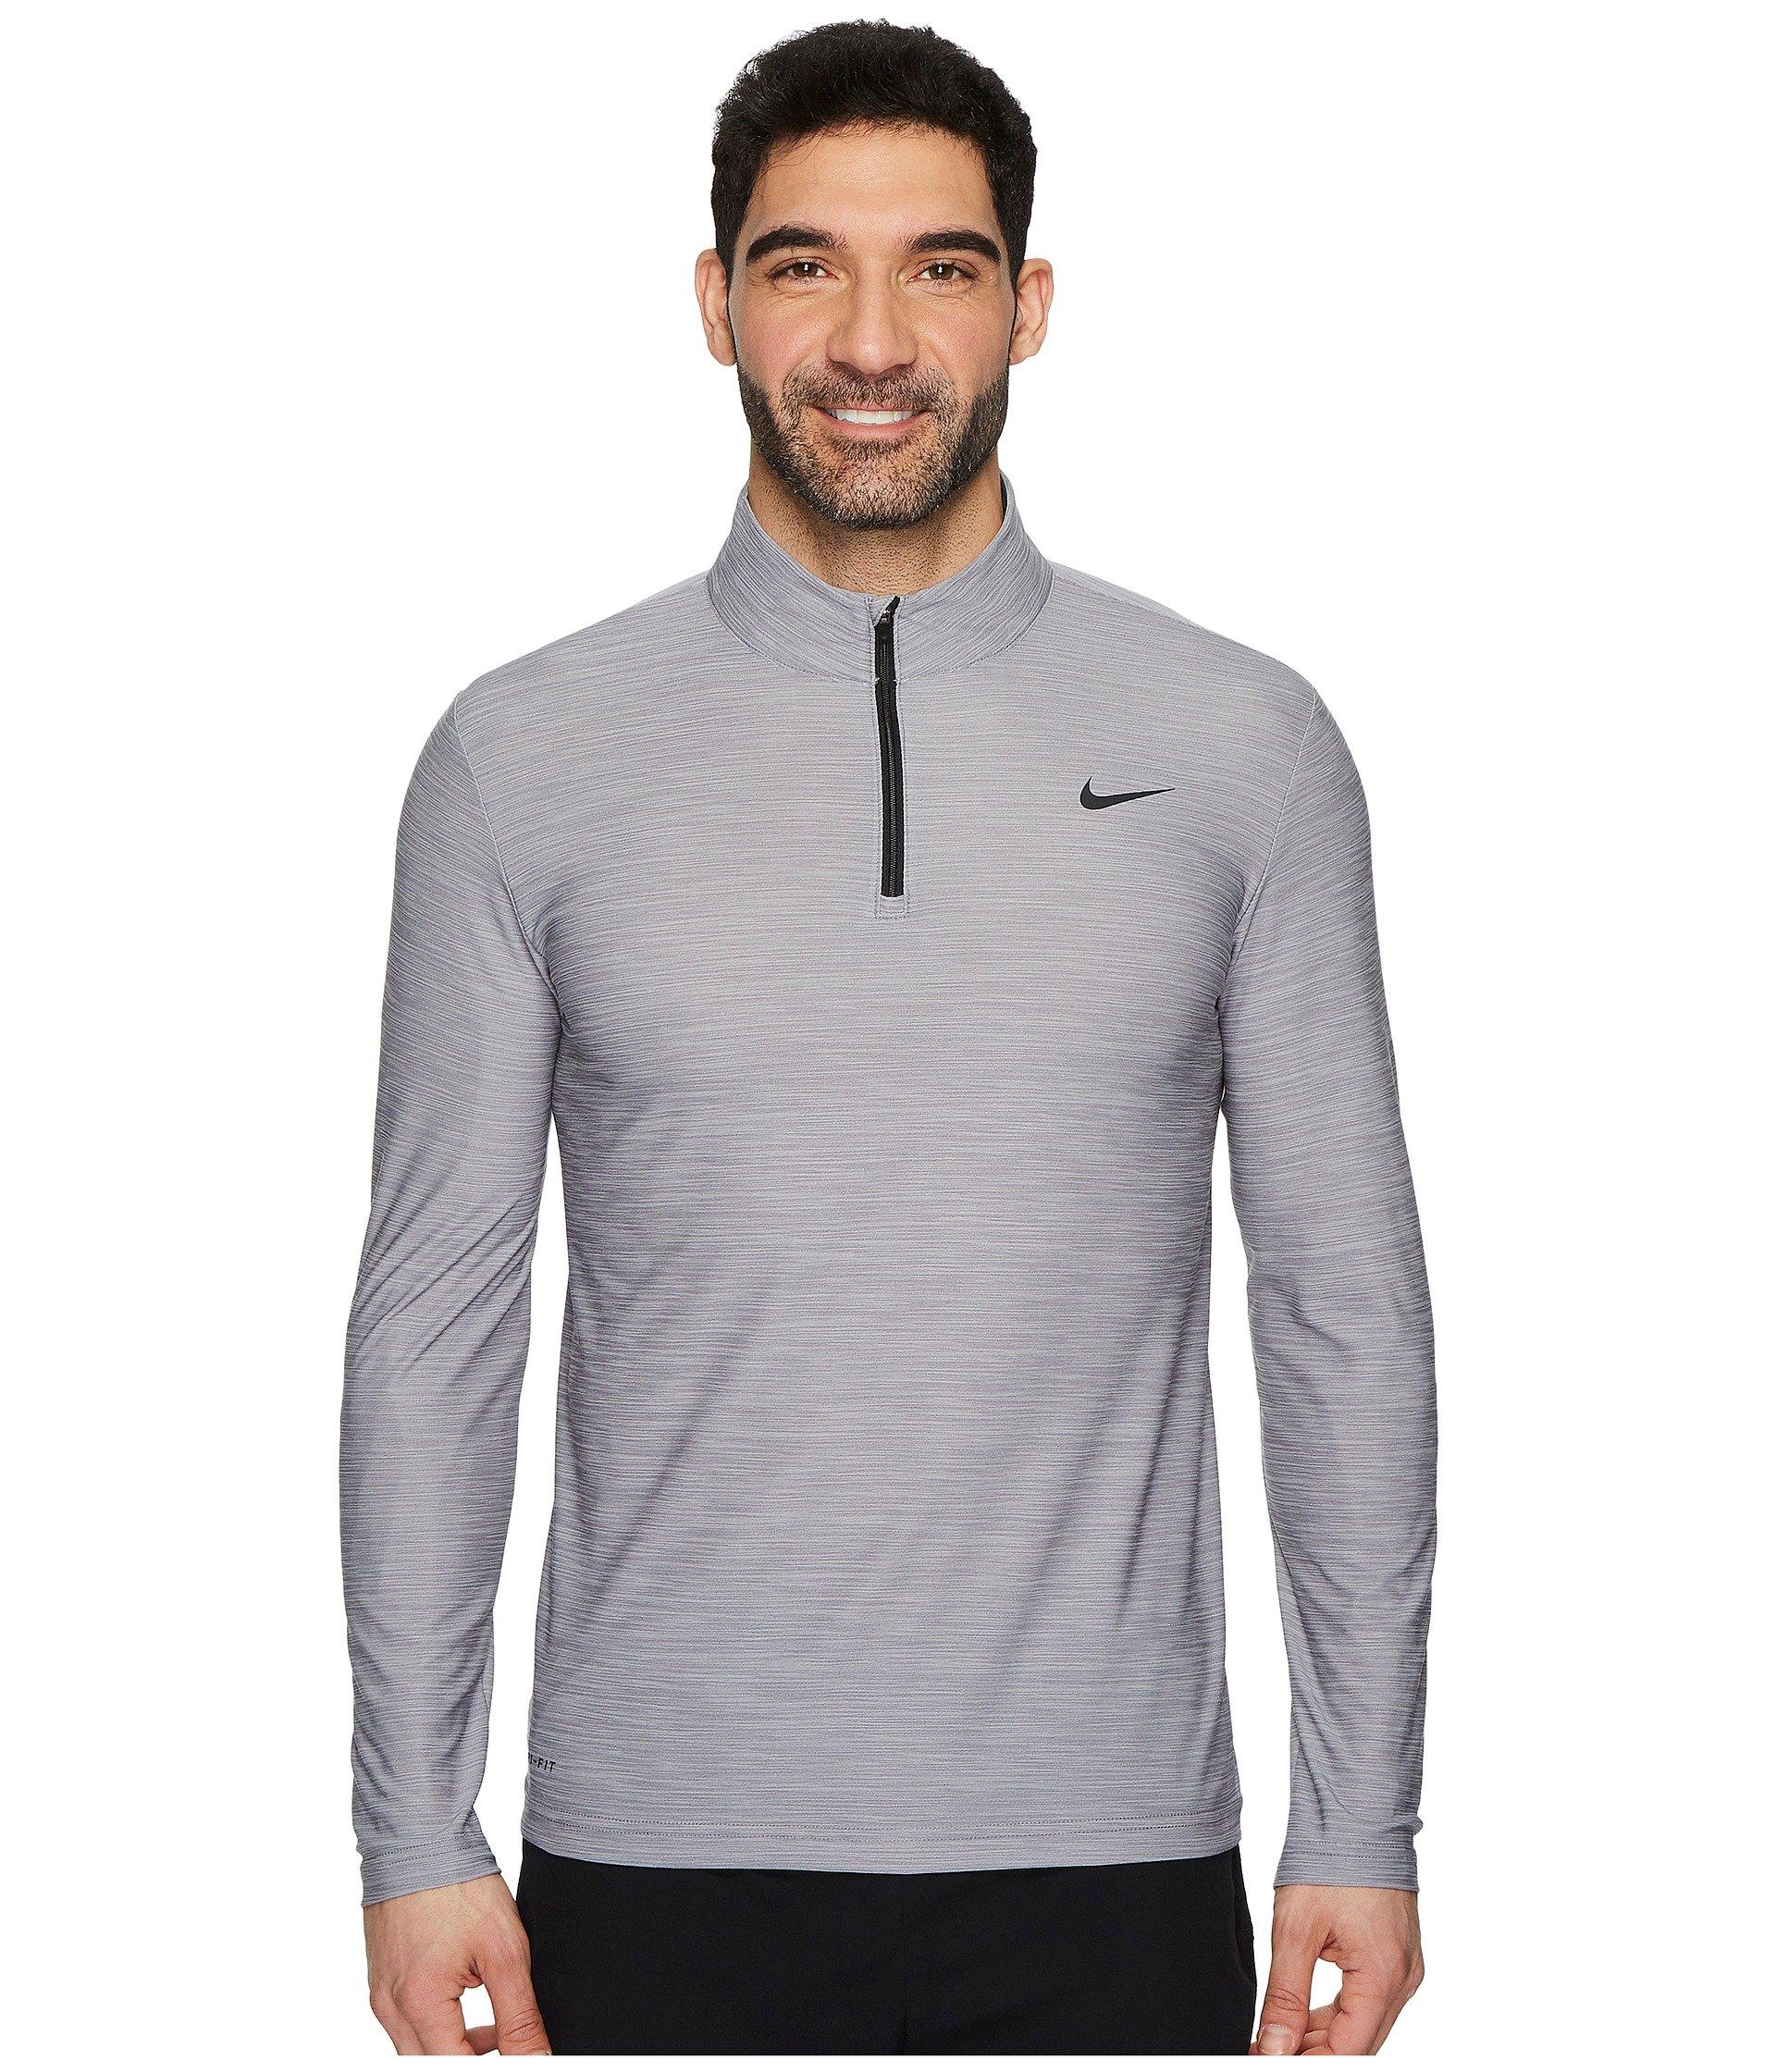 Nike Men's Breathe Dry Quarter Zip Long Sleeve Shirt (Atmosphere Grey/Gunsmoke-Black, Small) by Nike